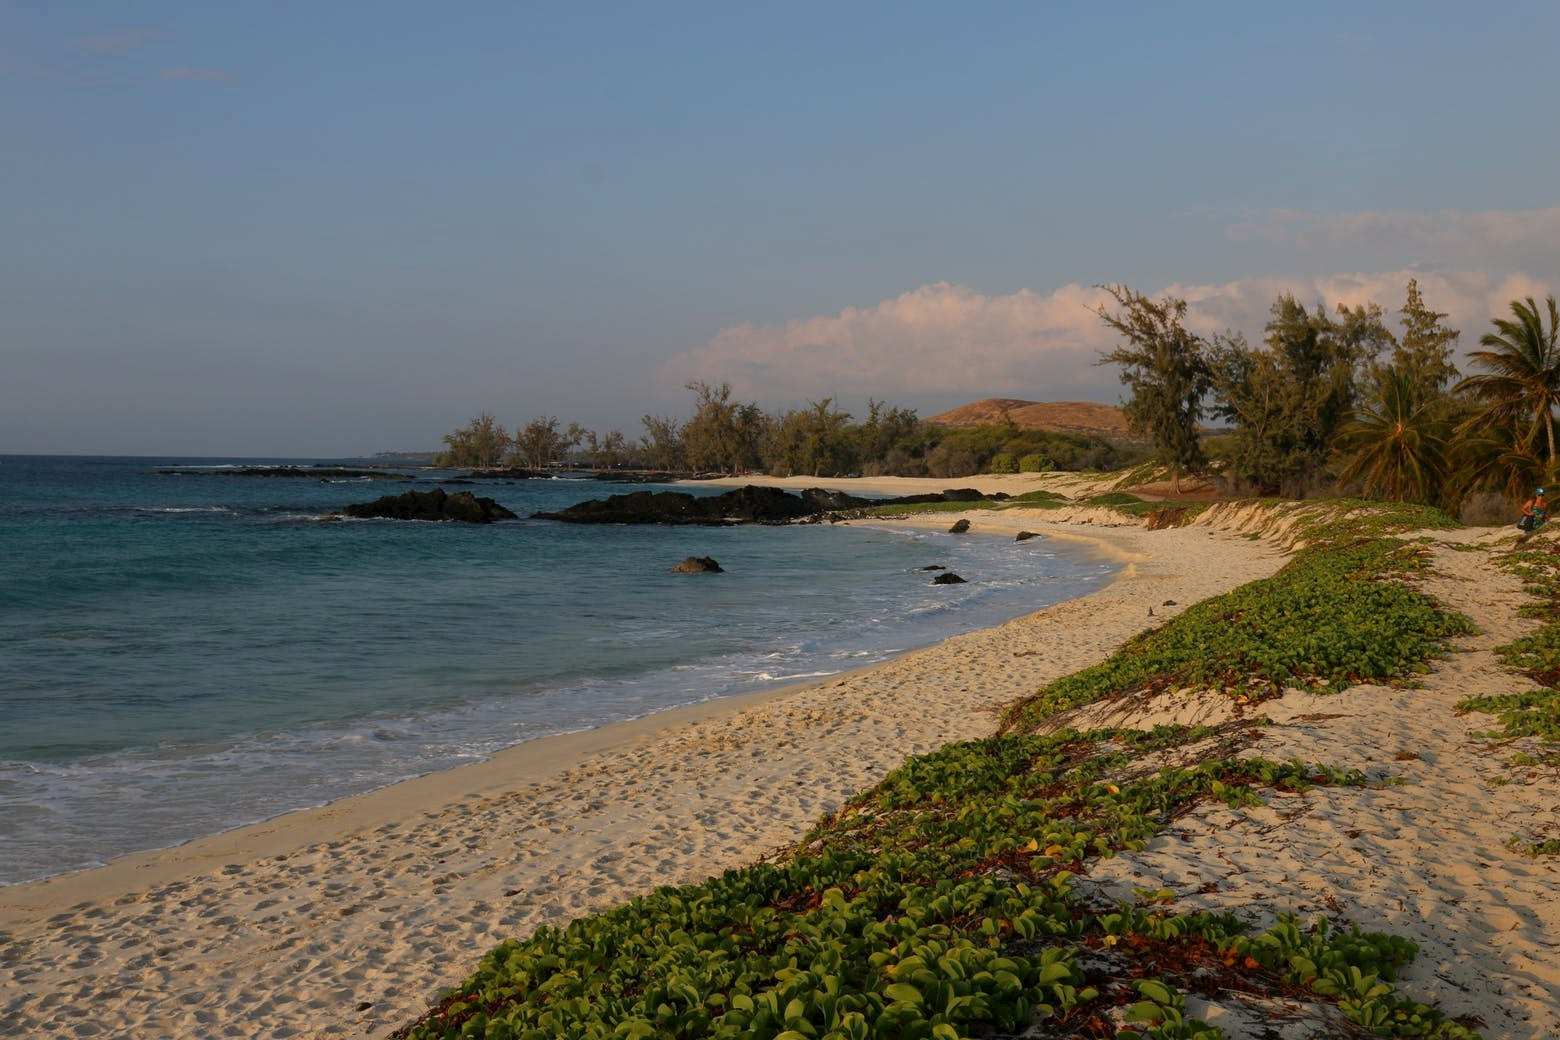 Beach landscape at golden hour at Spencer Beach.